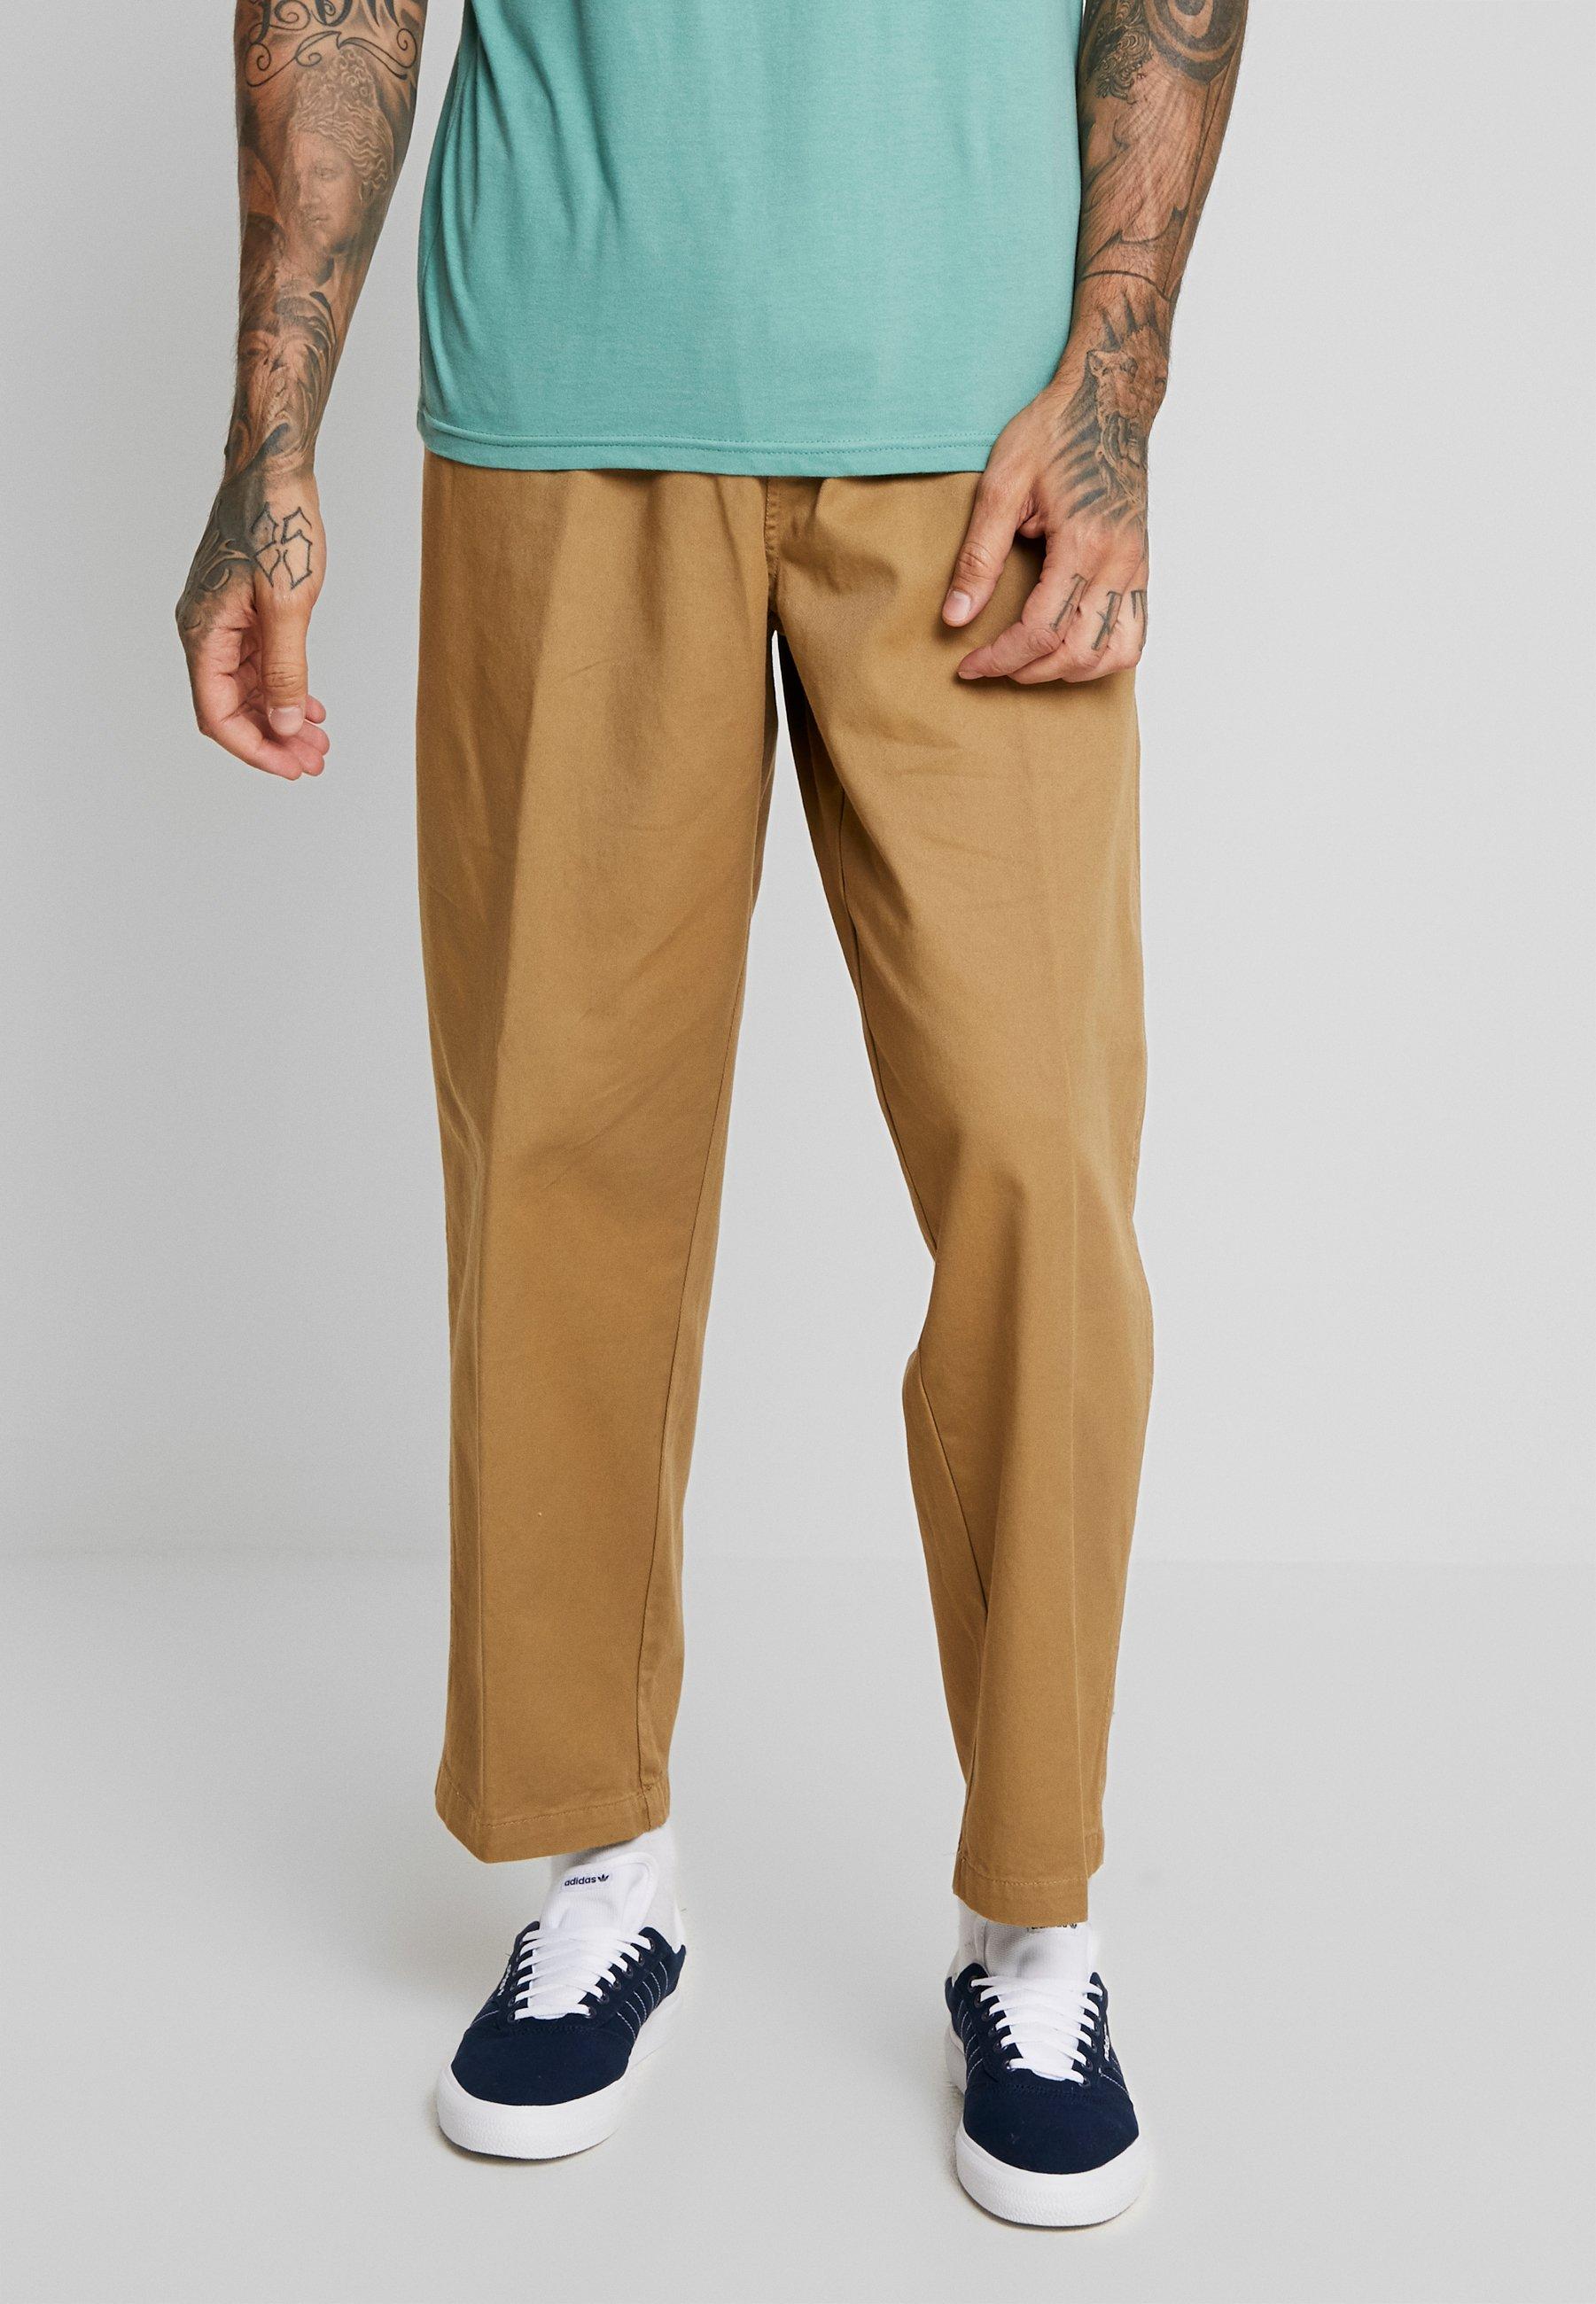 Clothing Easy Obey Classique Camel PantPantalon Ovwm8nN0